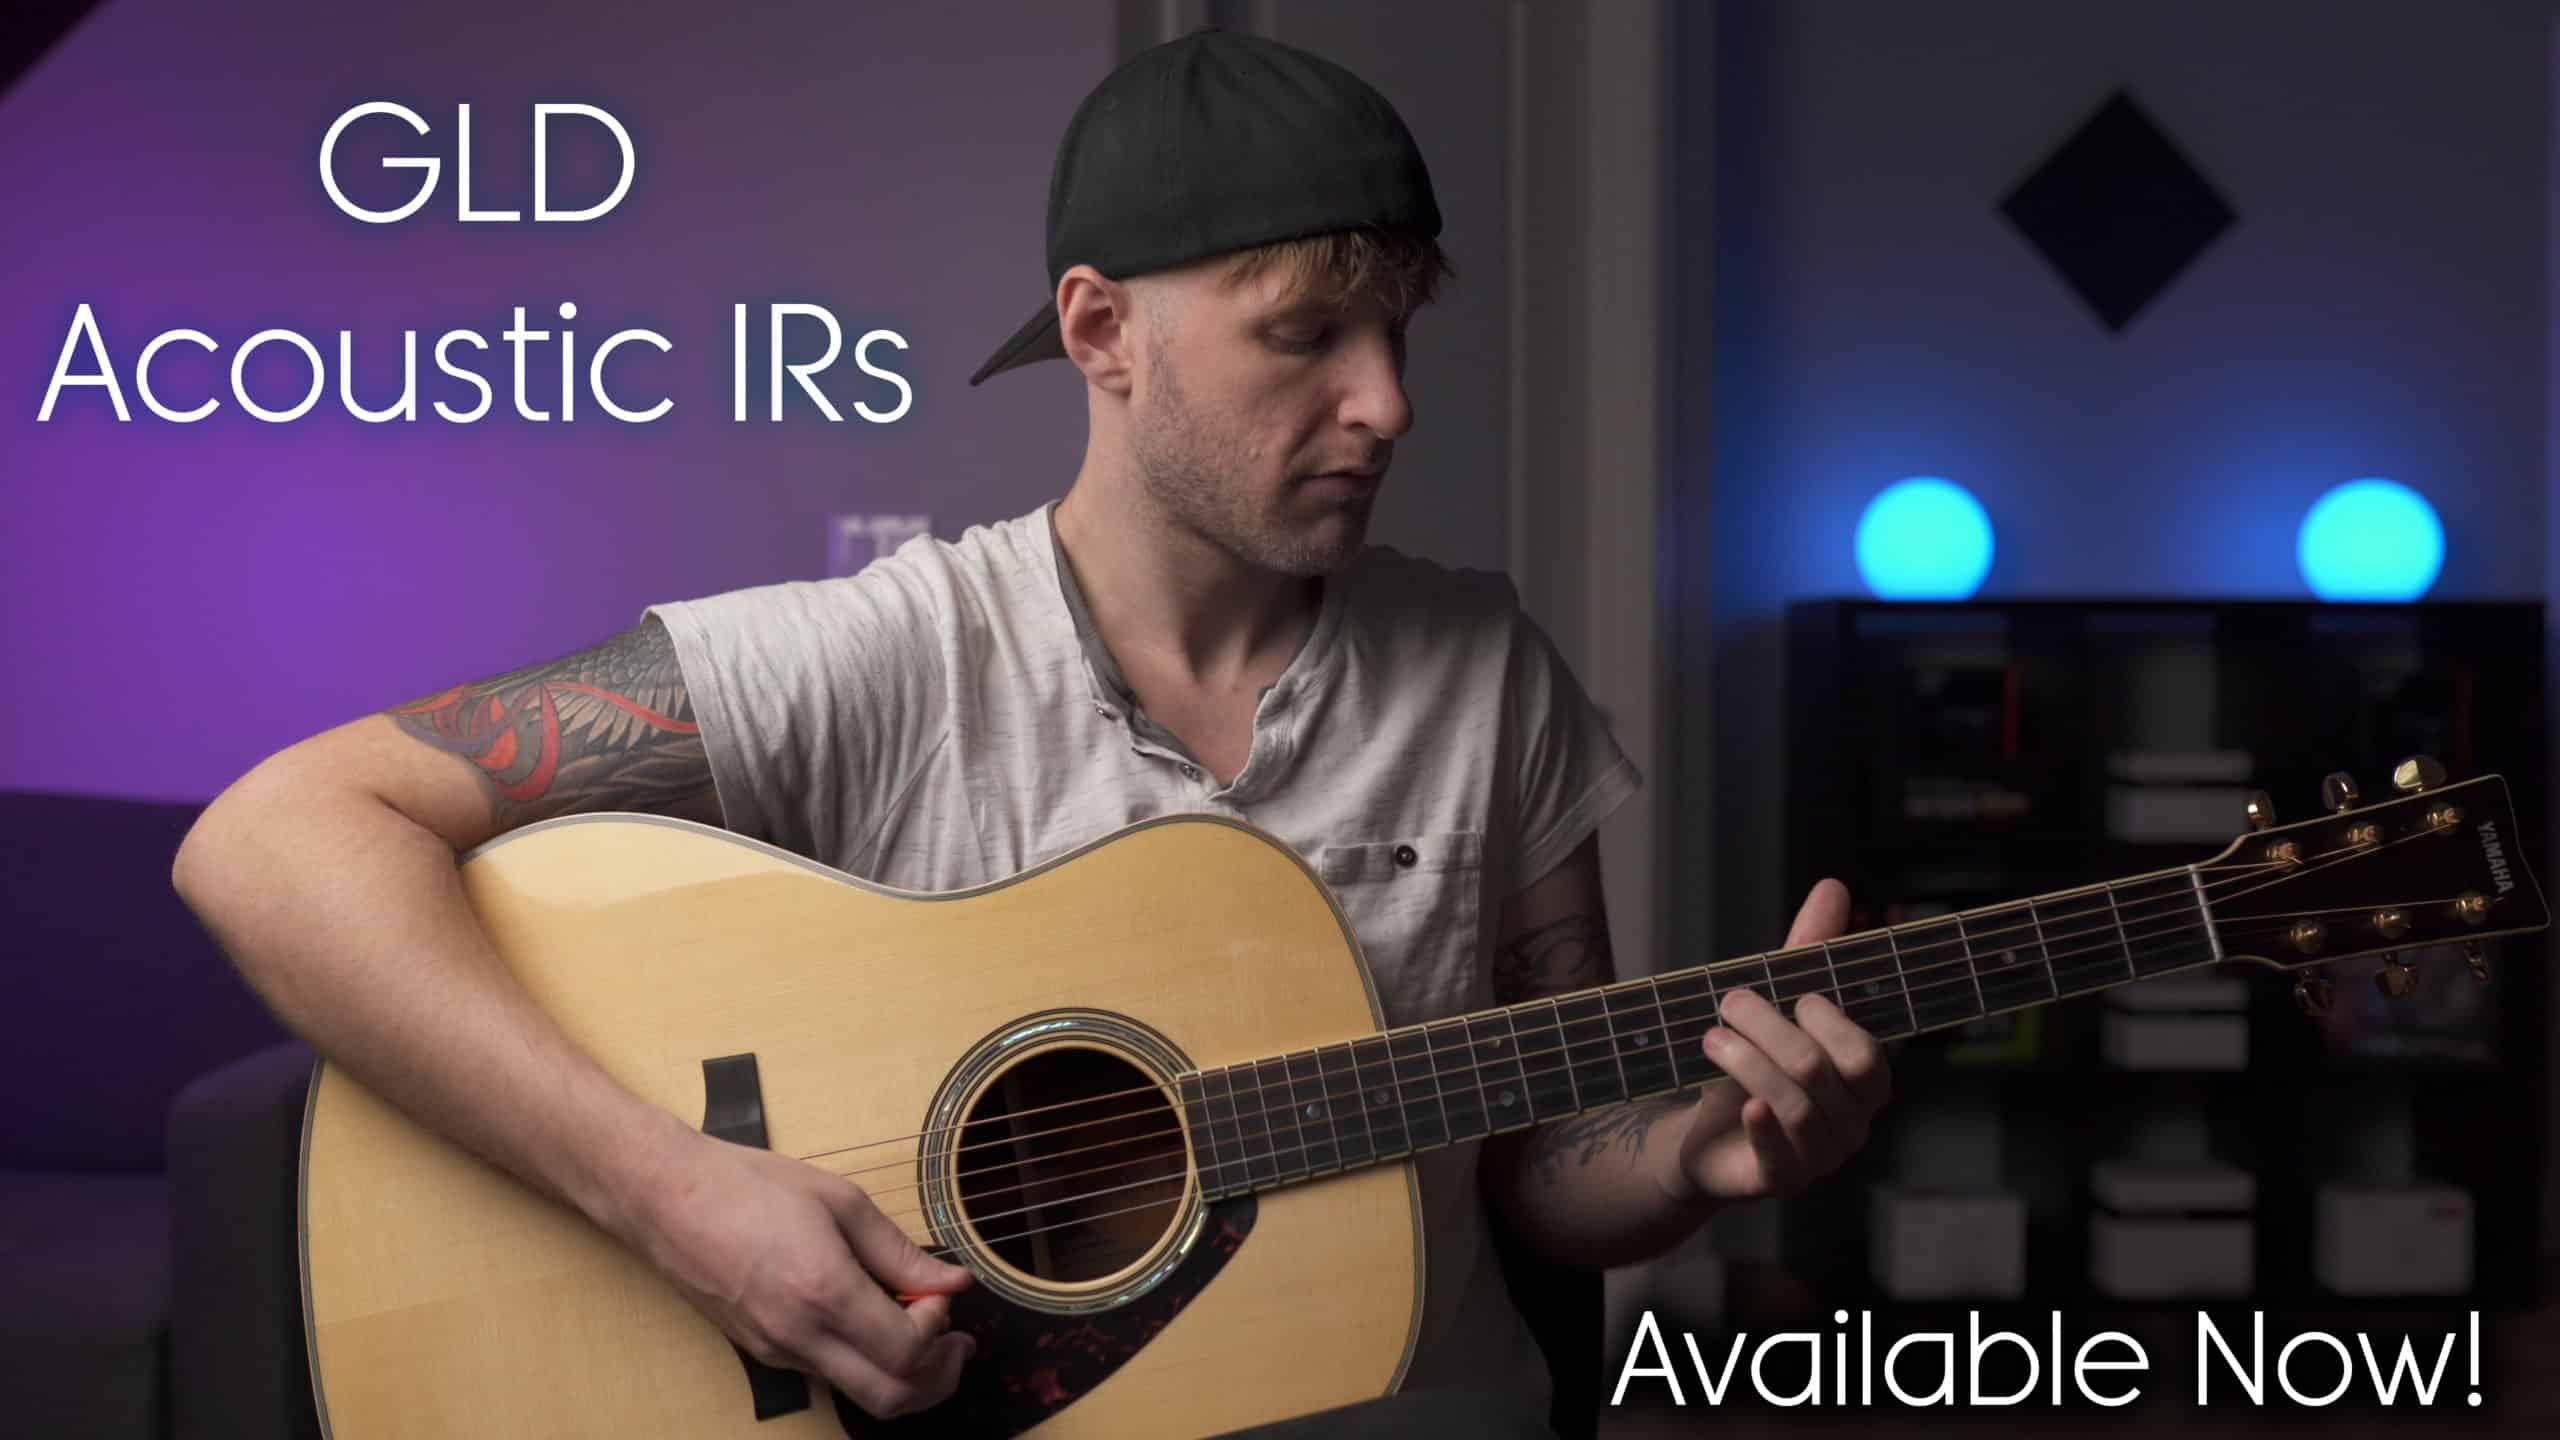 GLD Acoustic